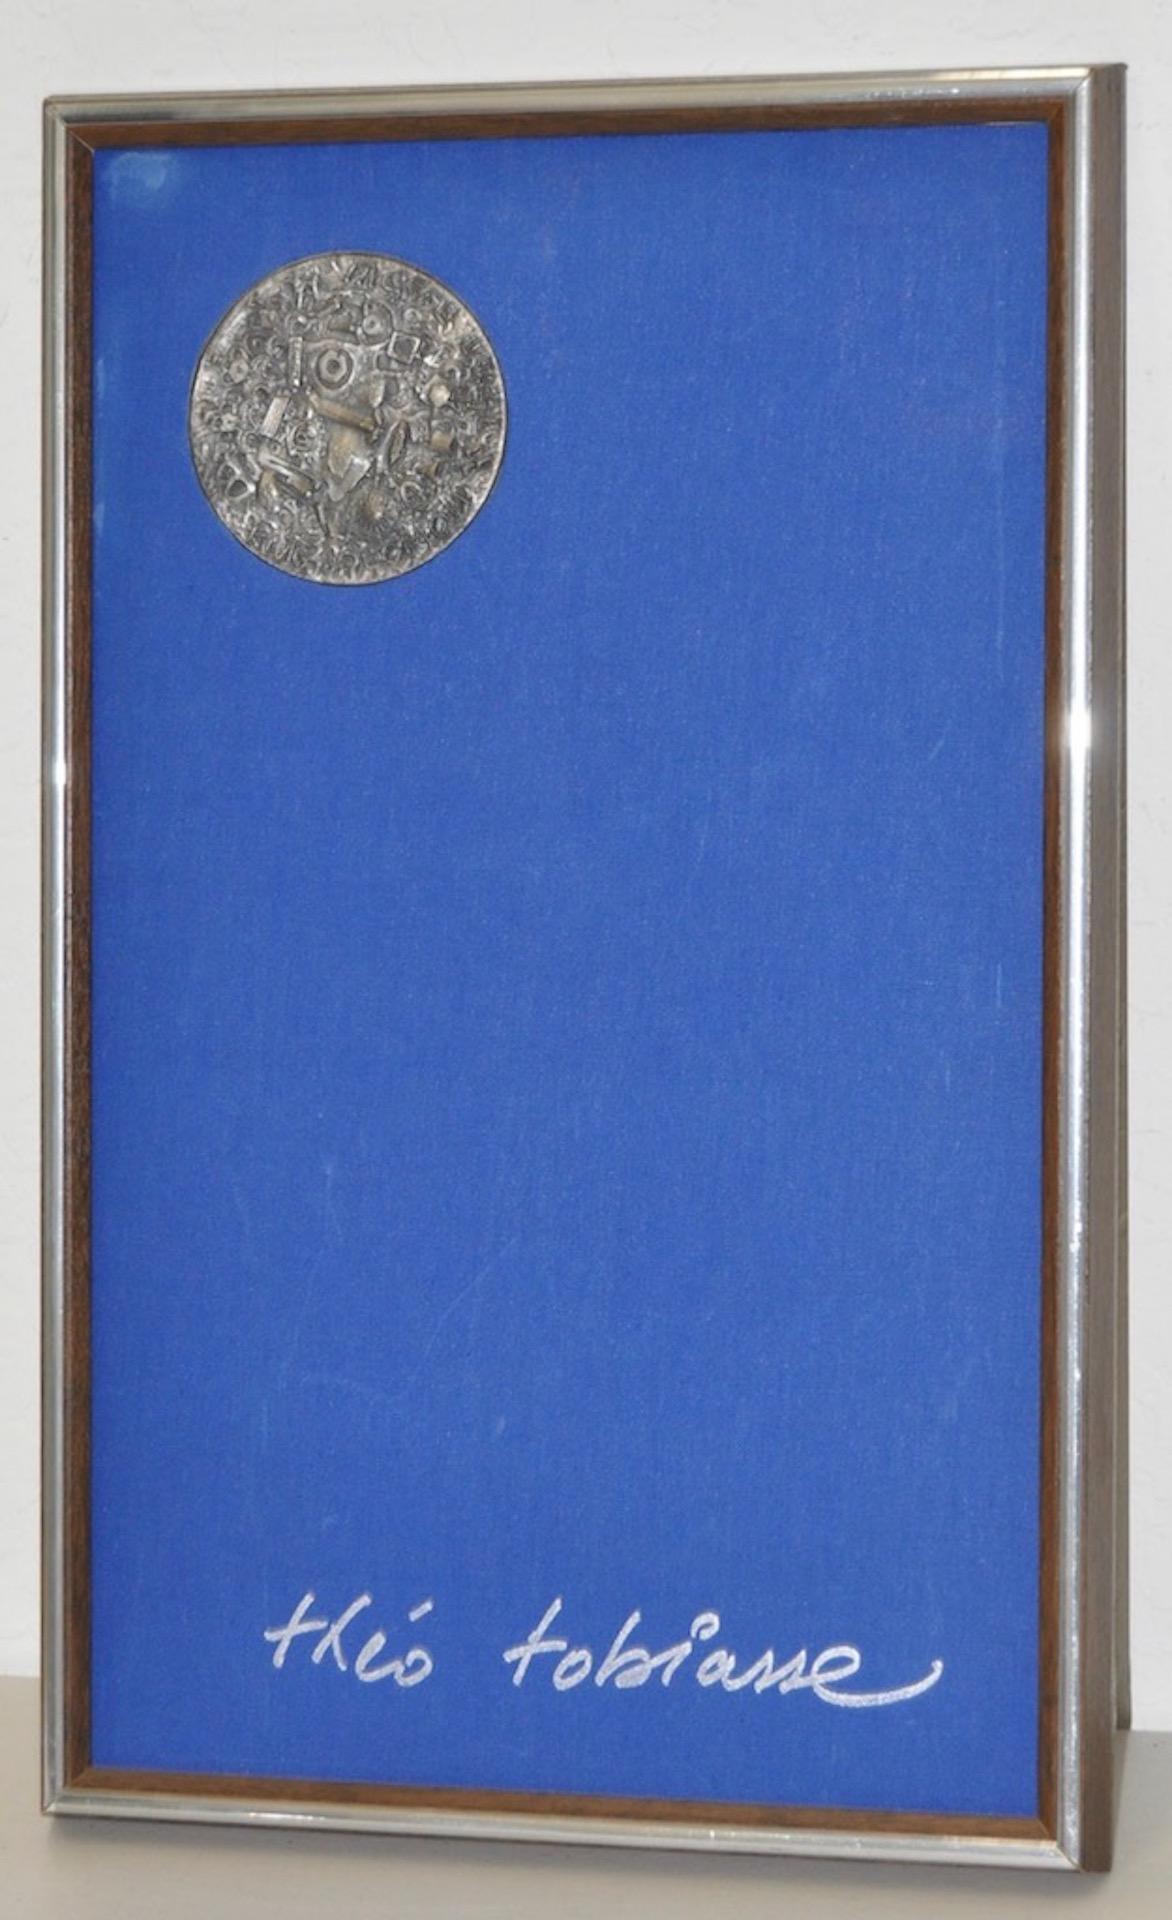 Theo Tobiasse (1927-2012) King Solomon Medallion c.1975